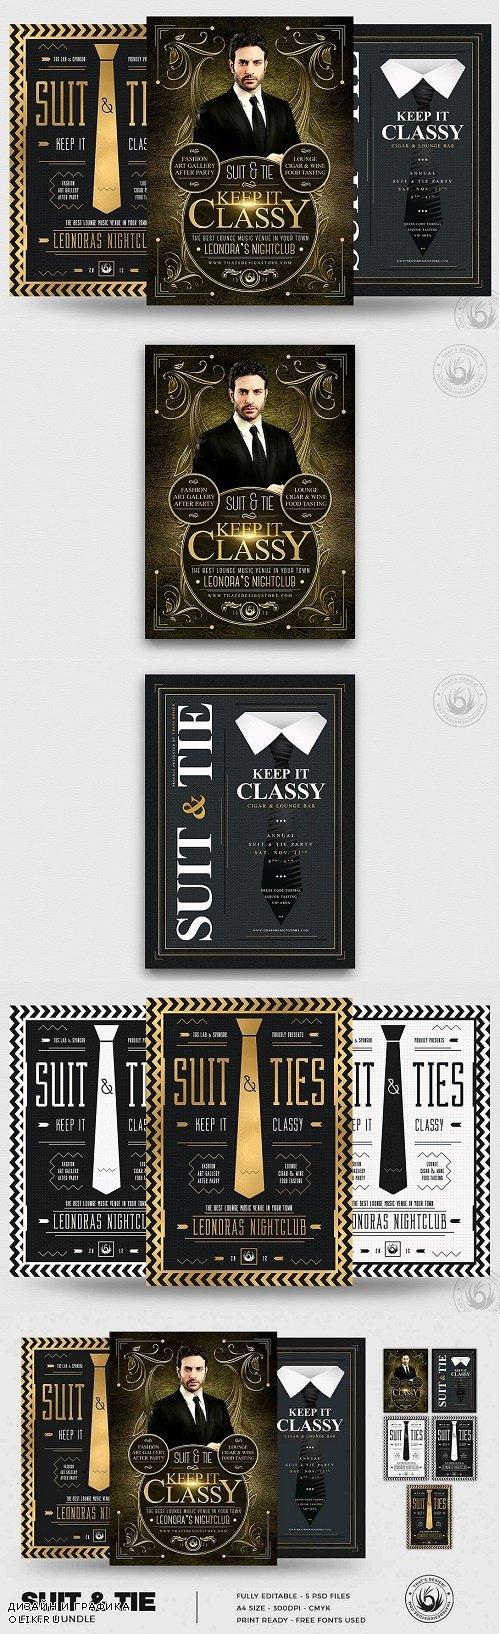 Suit and Tie Flyer Bundle - 4435741